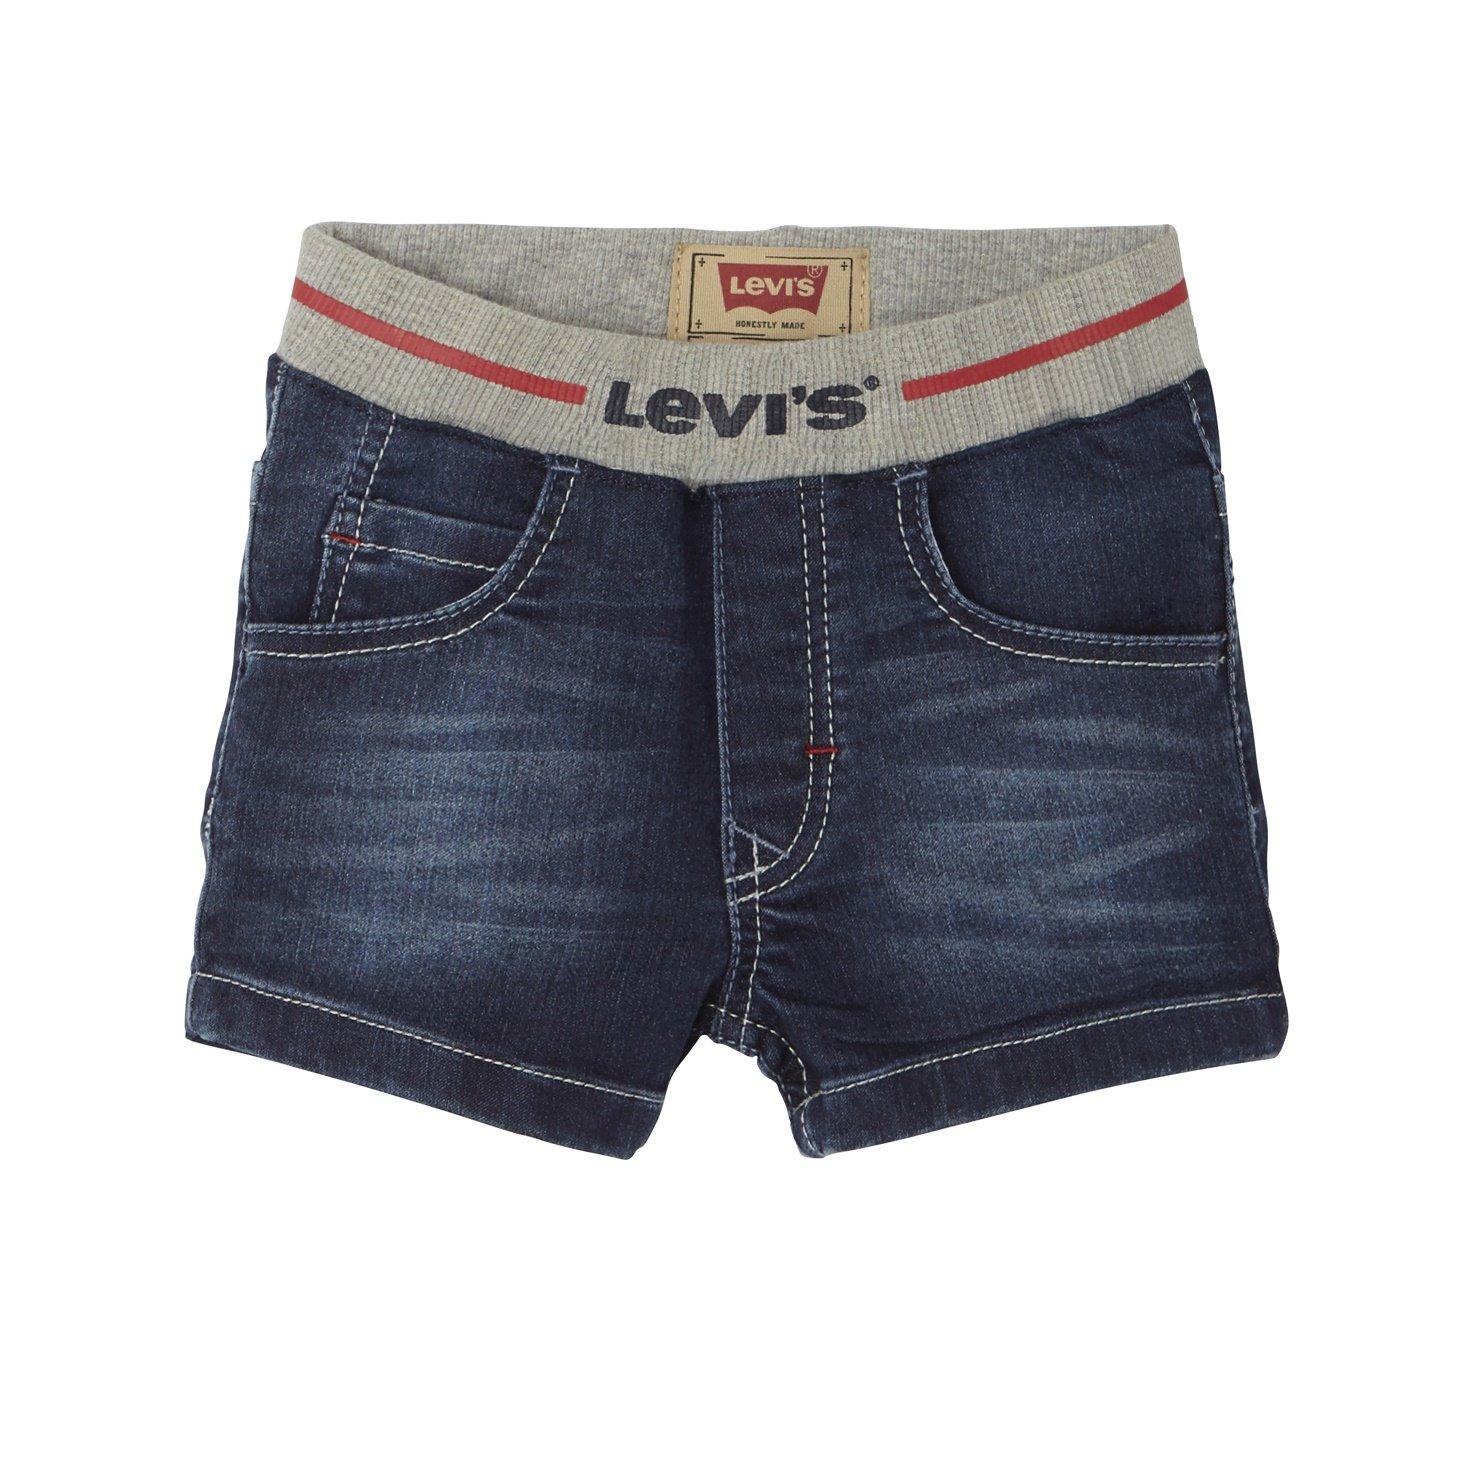 Levi'S Bermuda Pantaloncino Jeans Baby Bimbo NJ25024-46